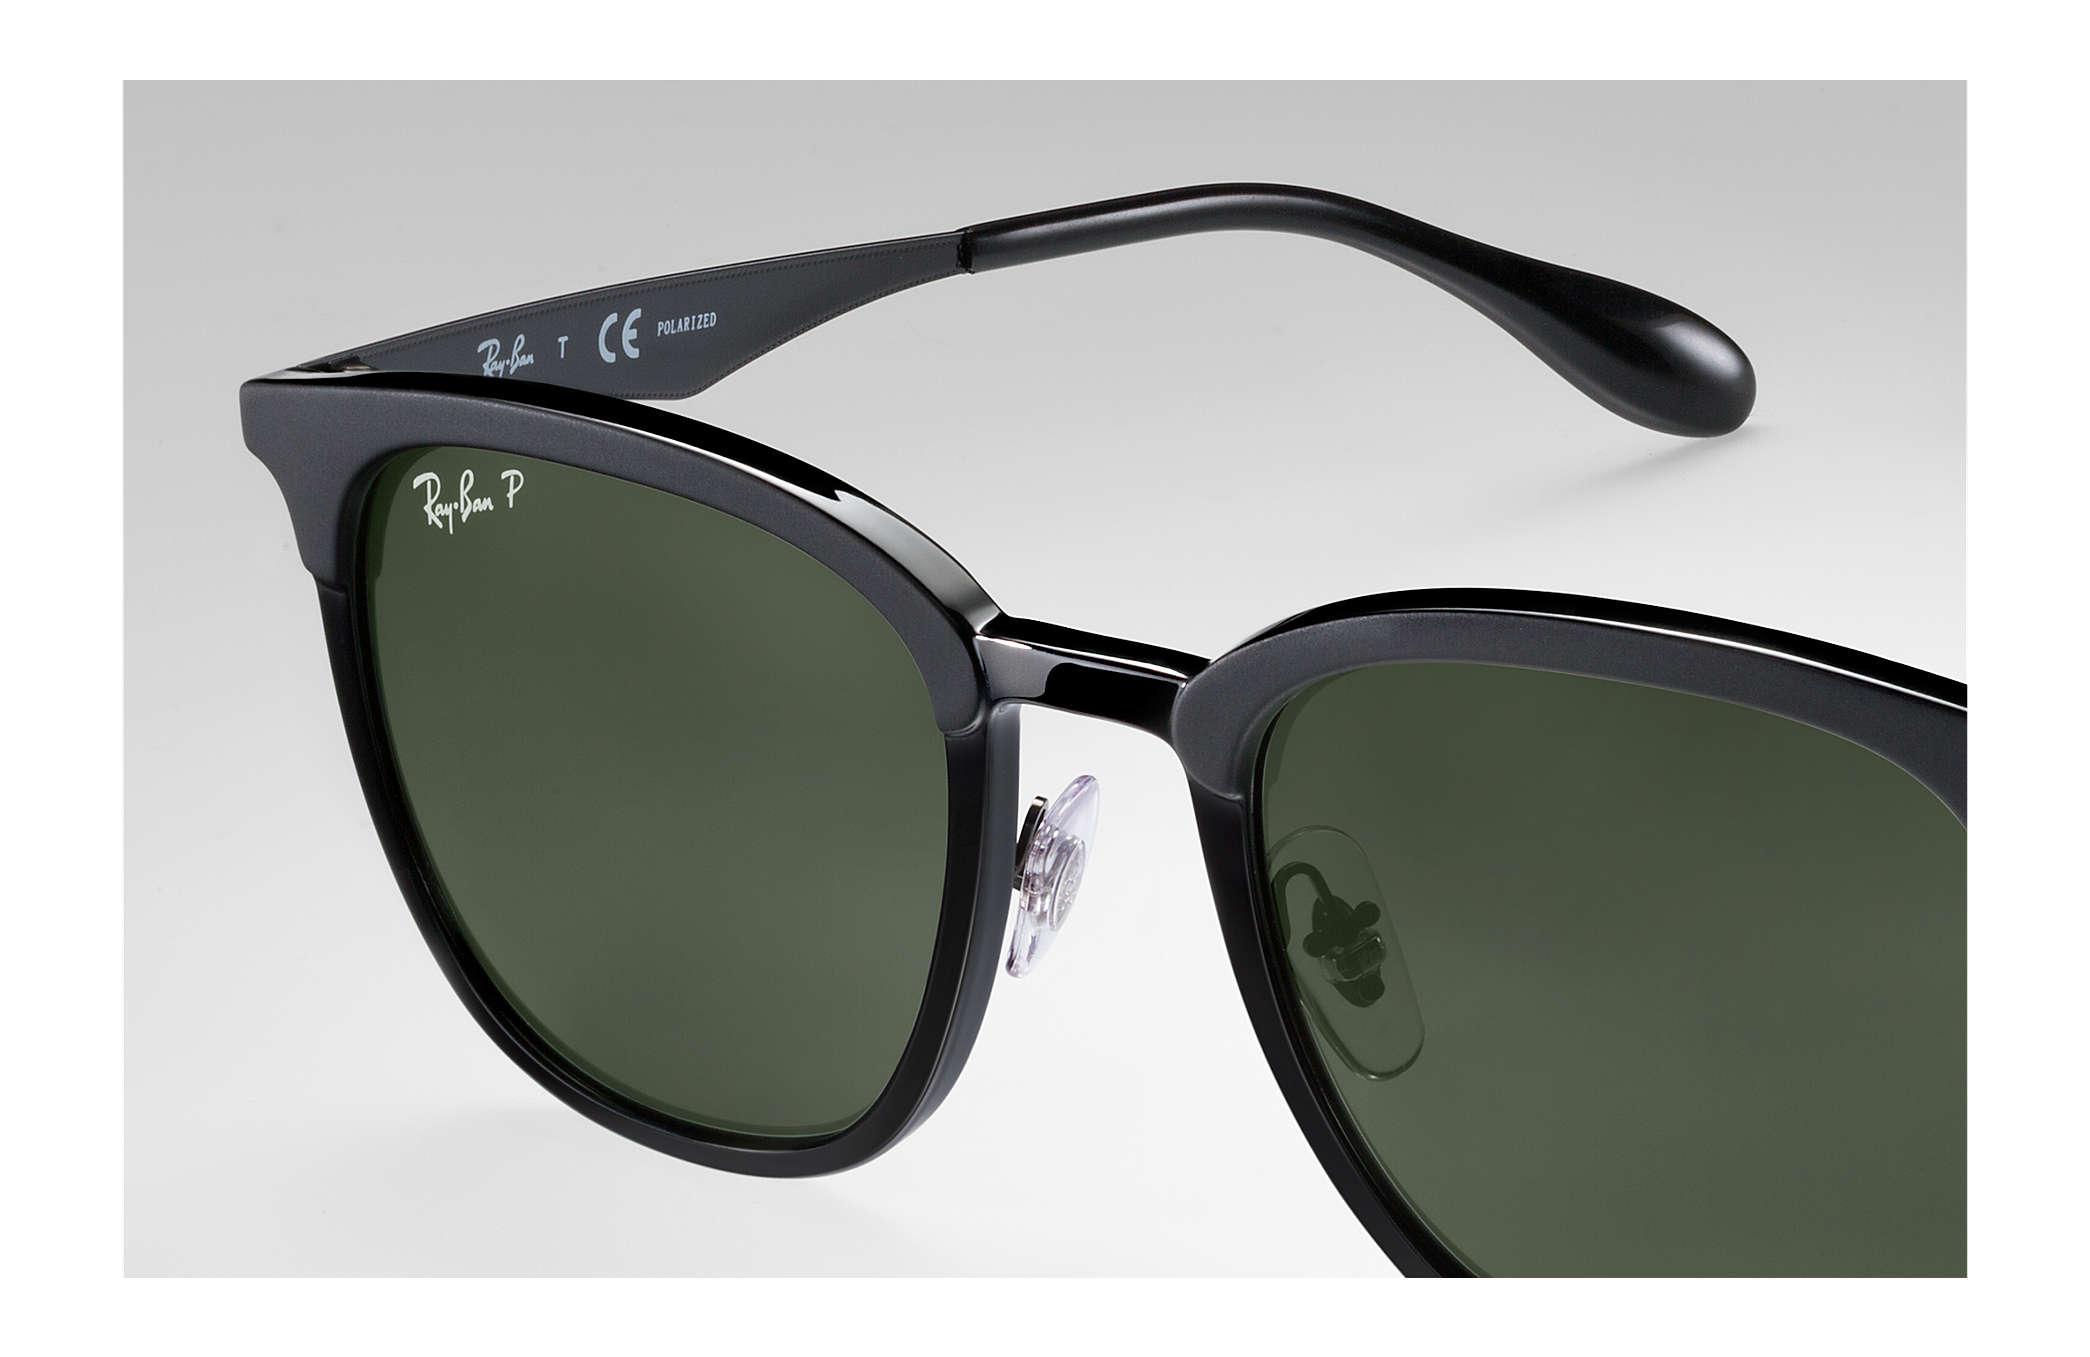 c80e49227c Ray-Ban RB4278 Black - Injected - Green Polarized Lenses ...